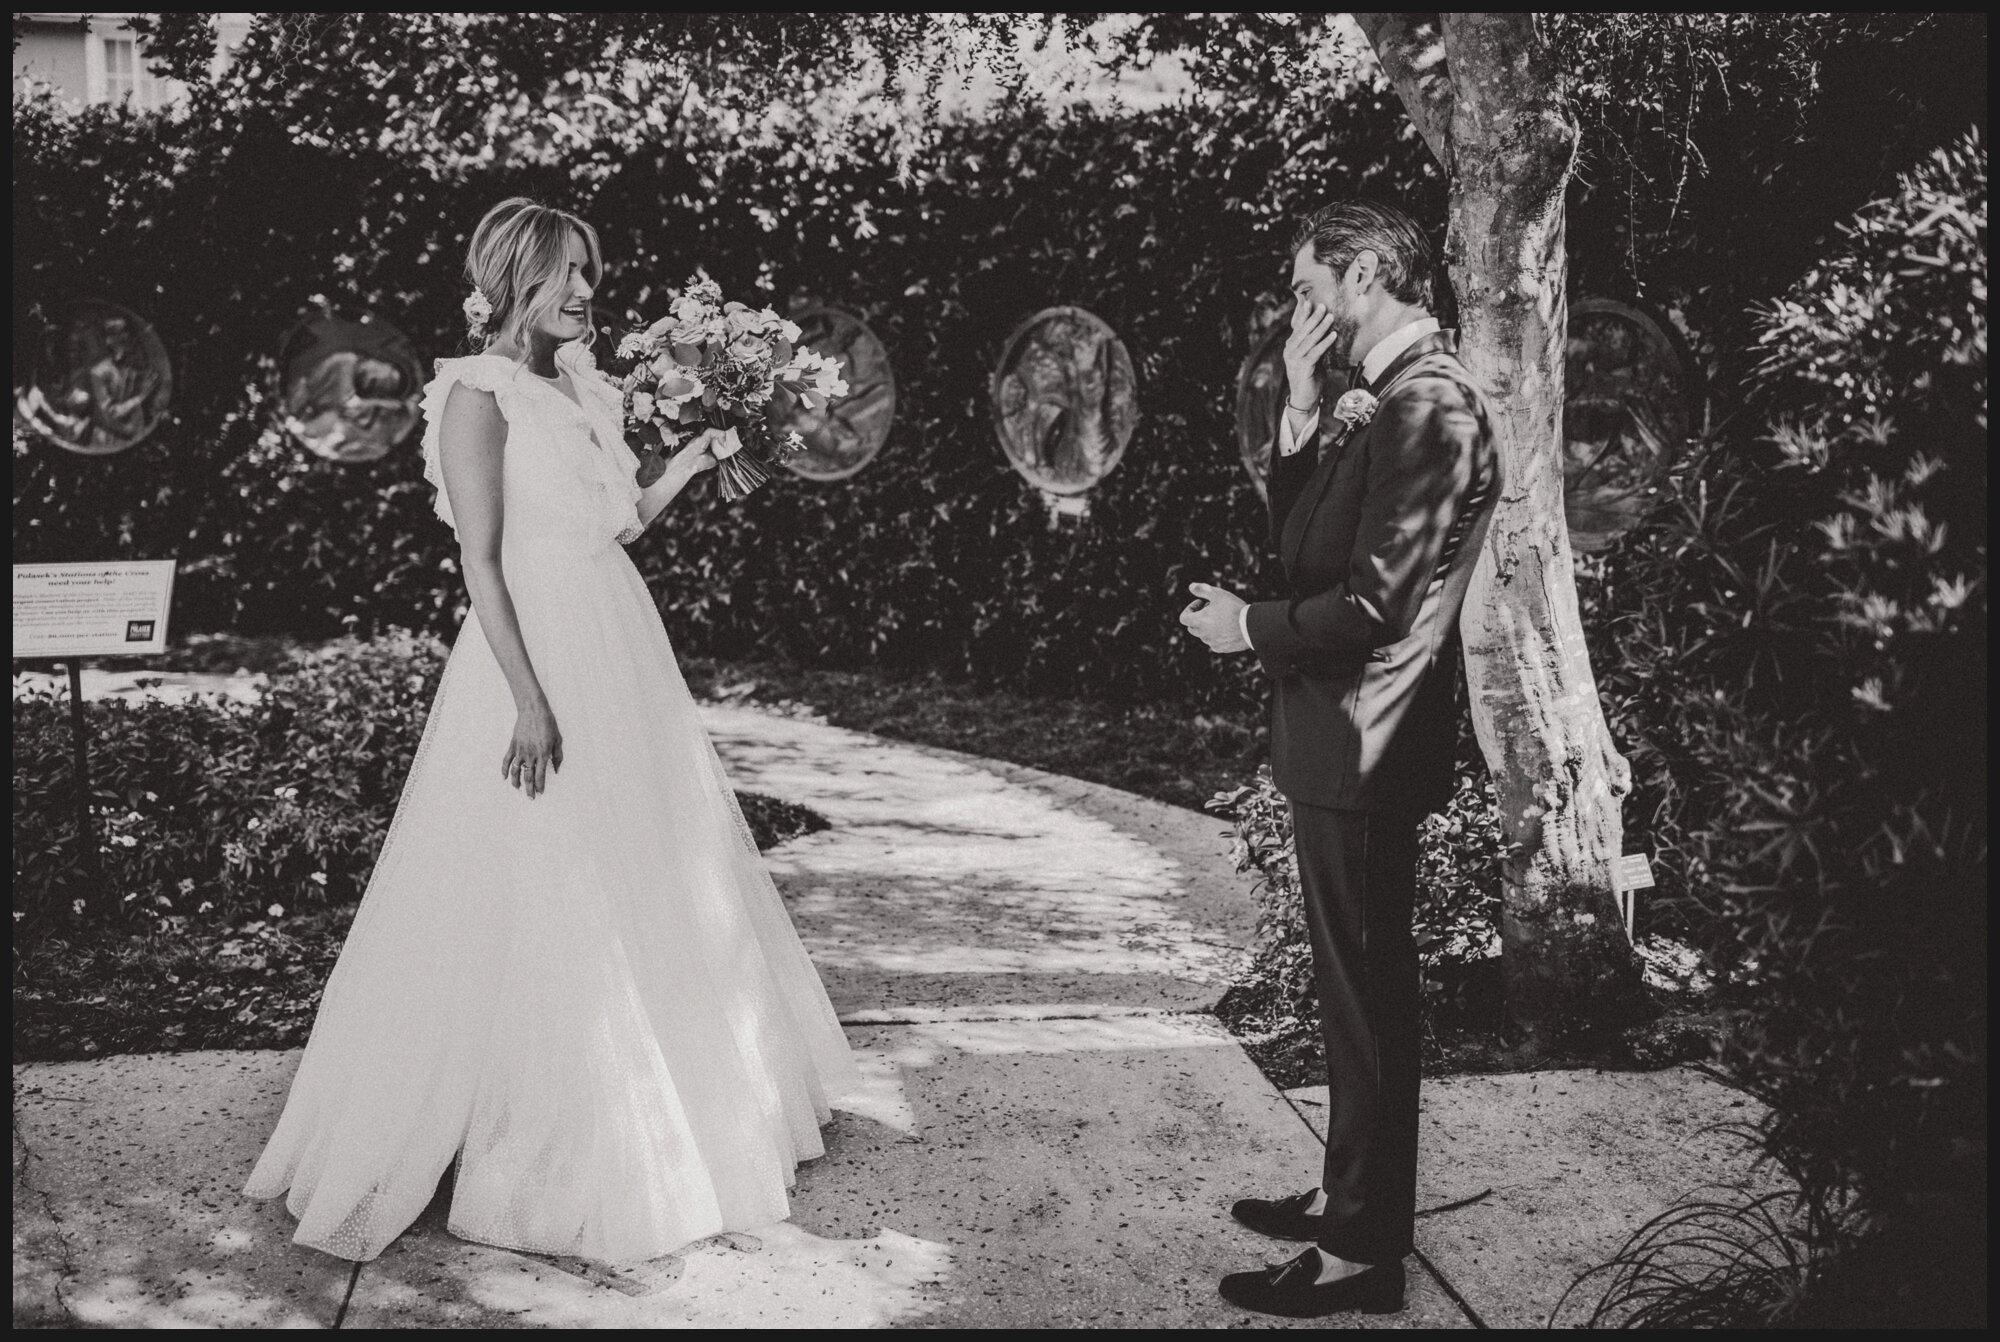 Orlando-Wedding-Photographer-destination-wedding-photographer-florida-wedding-photographer-hawaii-wedding-photographer_0740.jpg